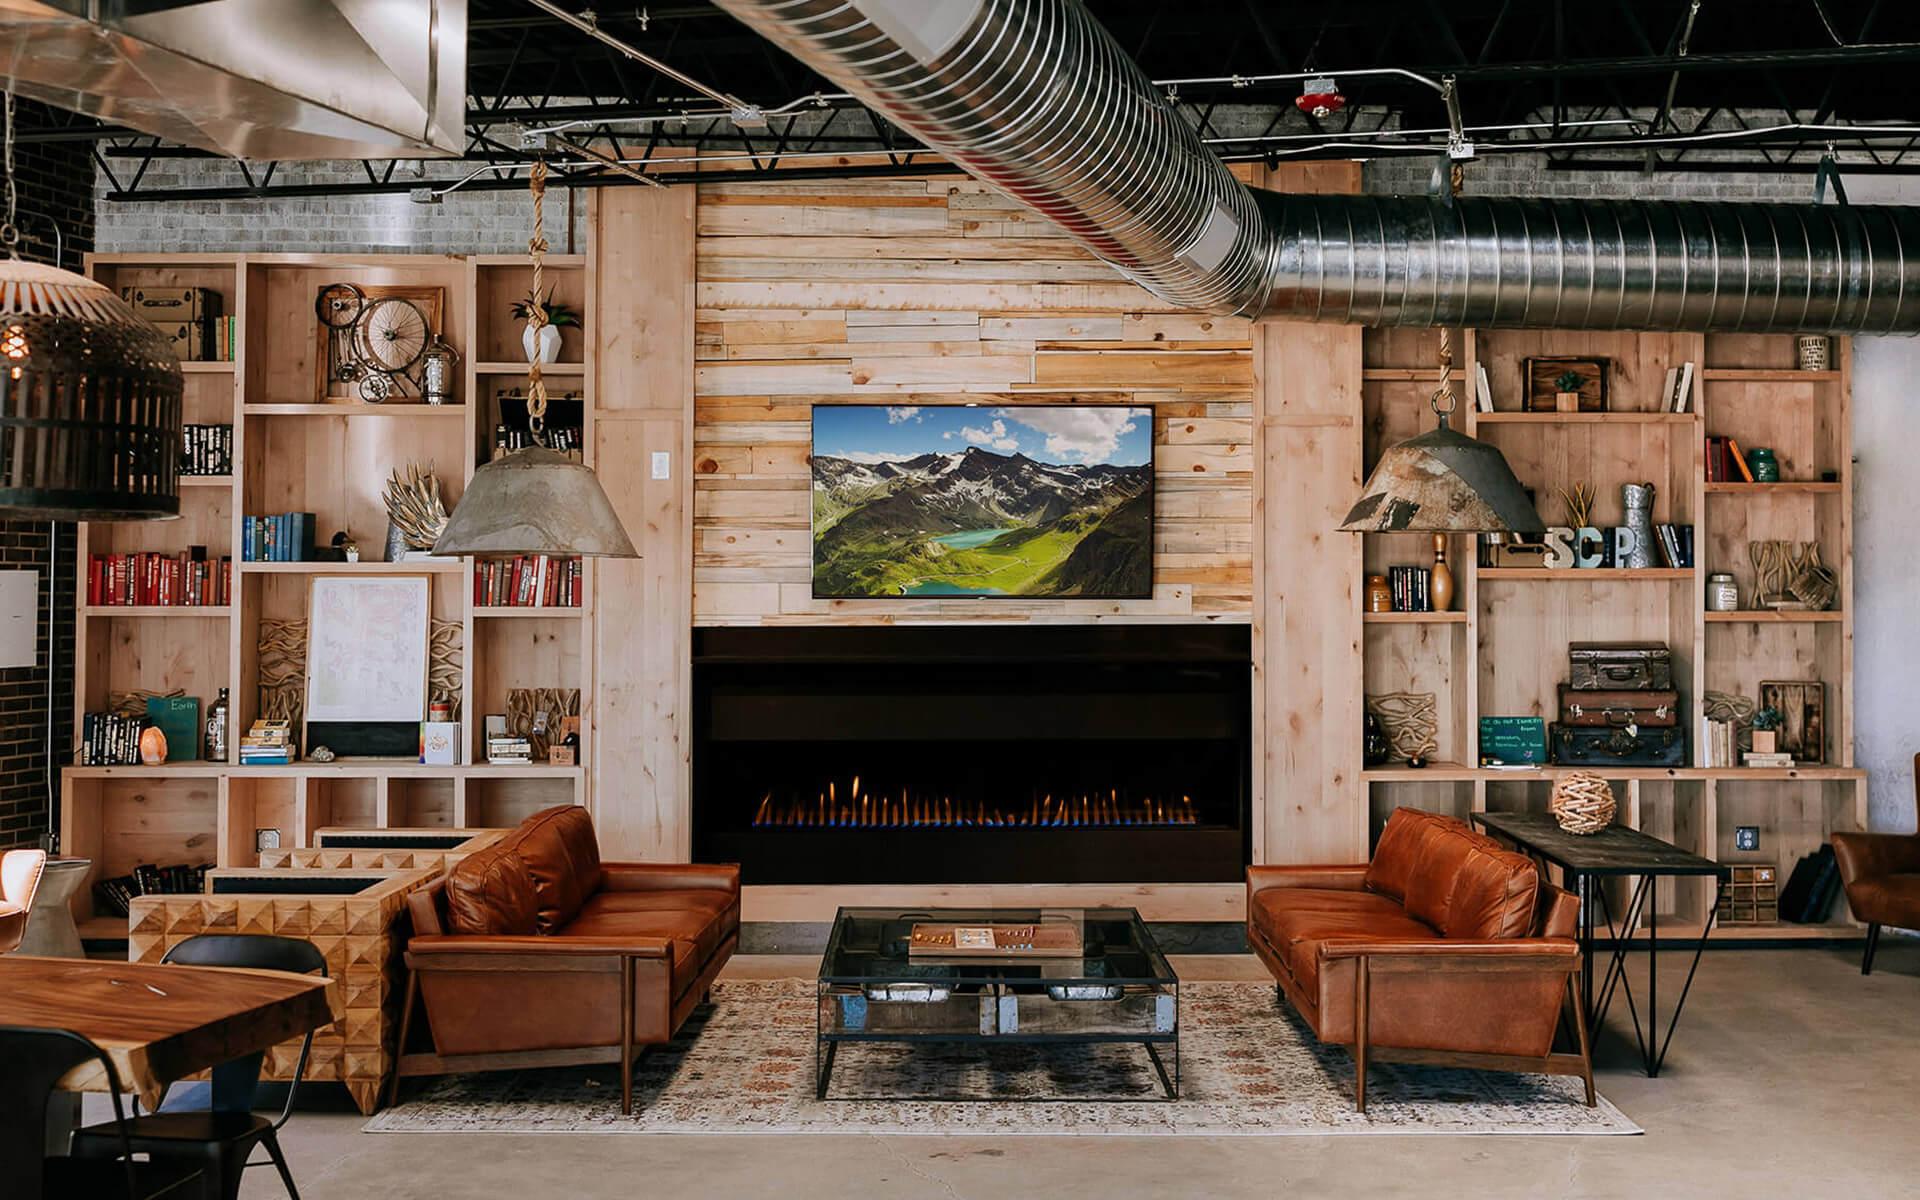 SCP Hotel Colorado Springs – Central CO